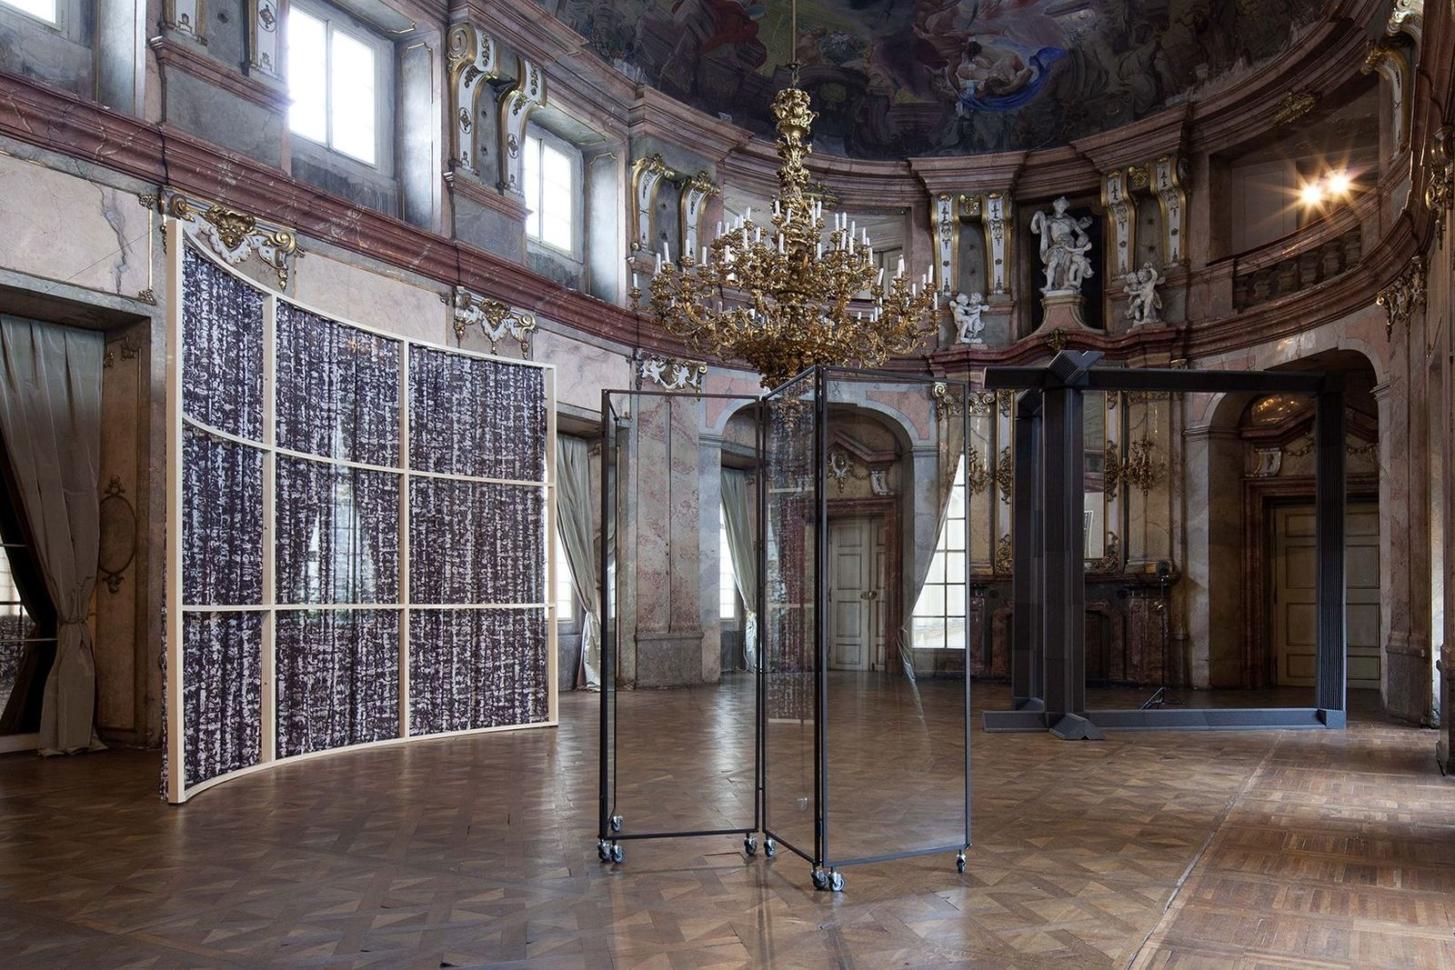 view to the exhibition Roman Štětina: Foreword, Colloredo-Mansfeld Palace, 2018. Photo by Tomáš Souček